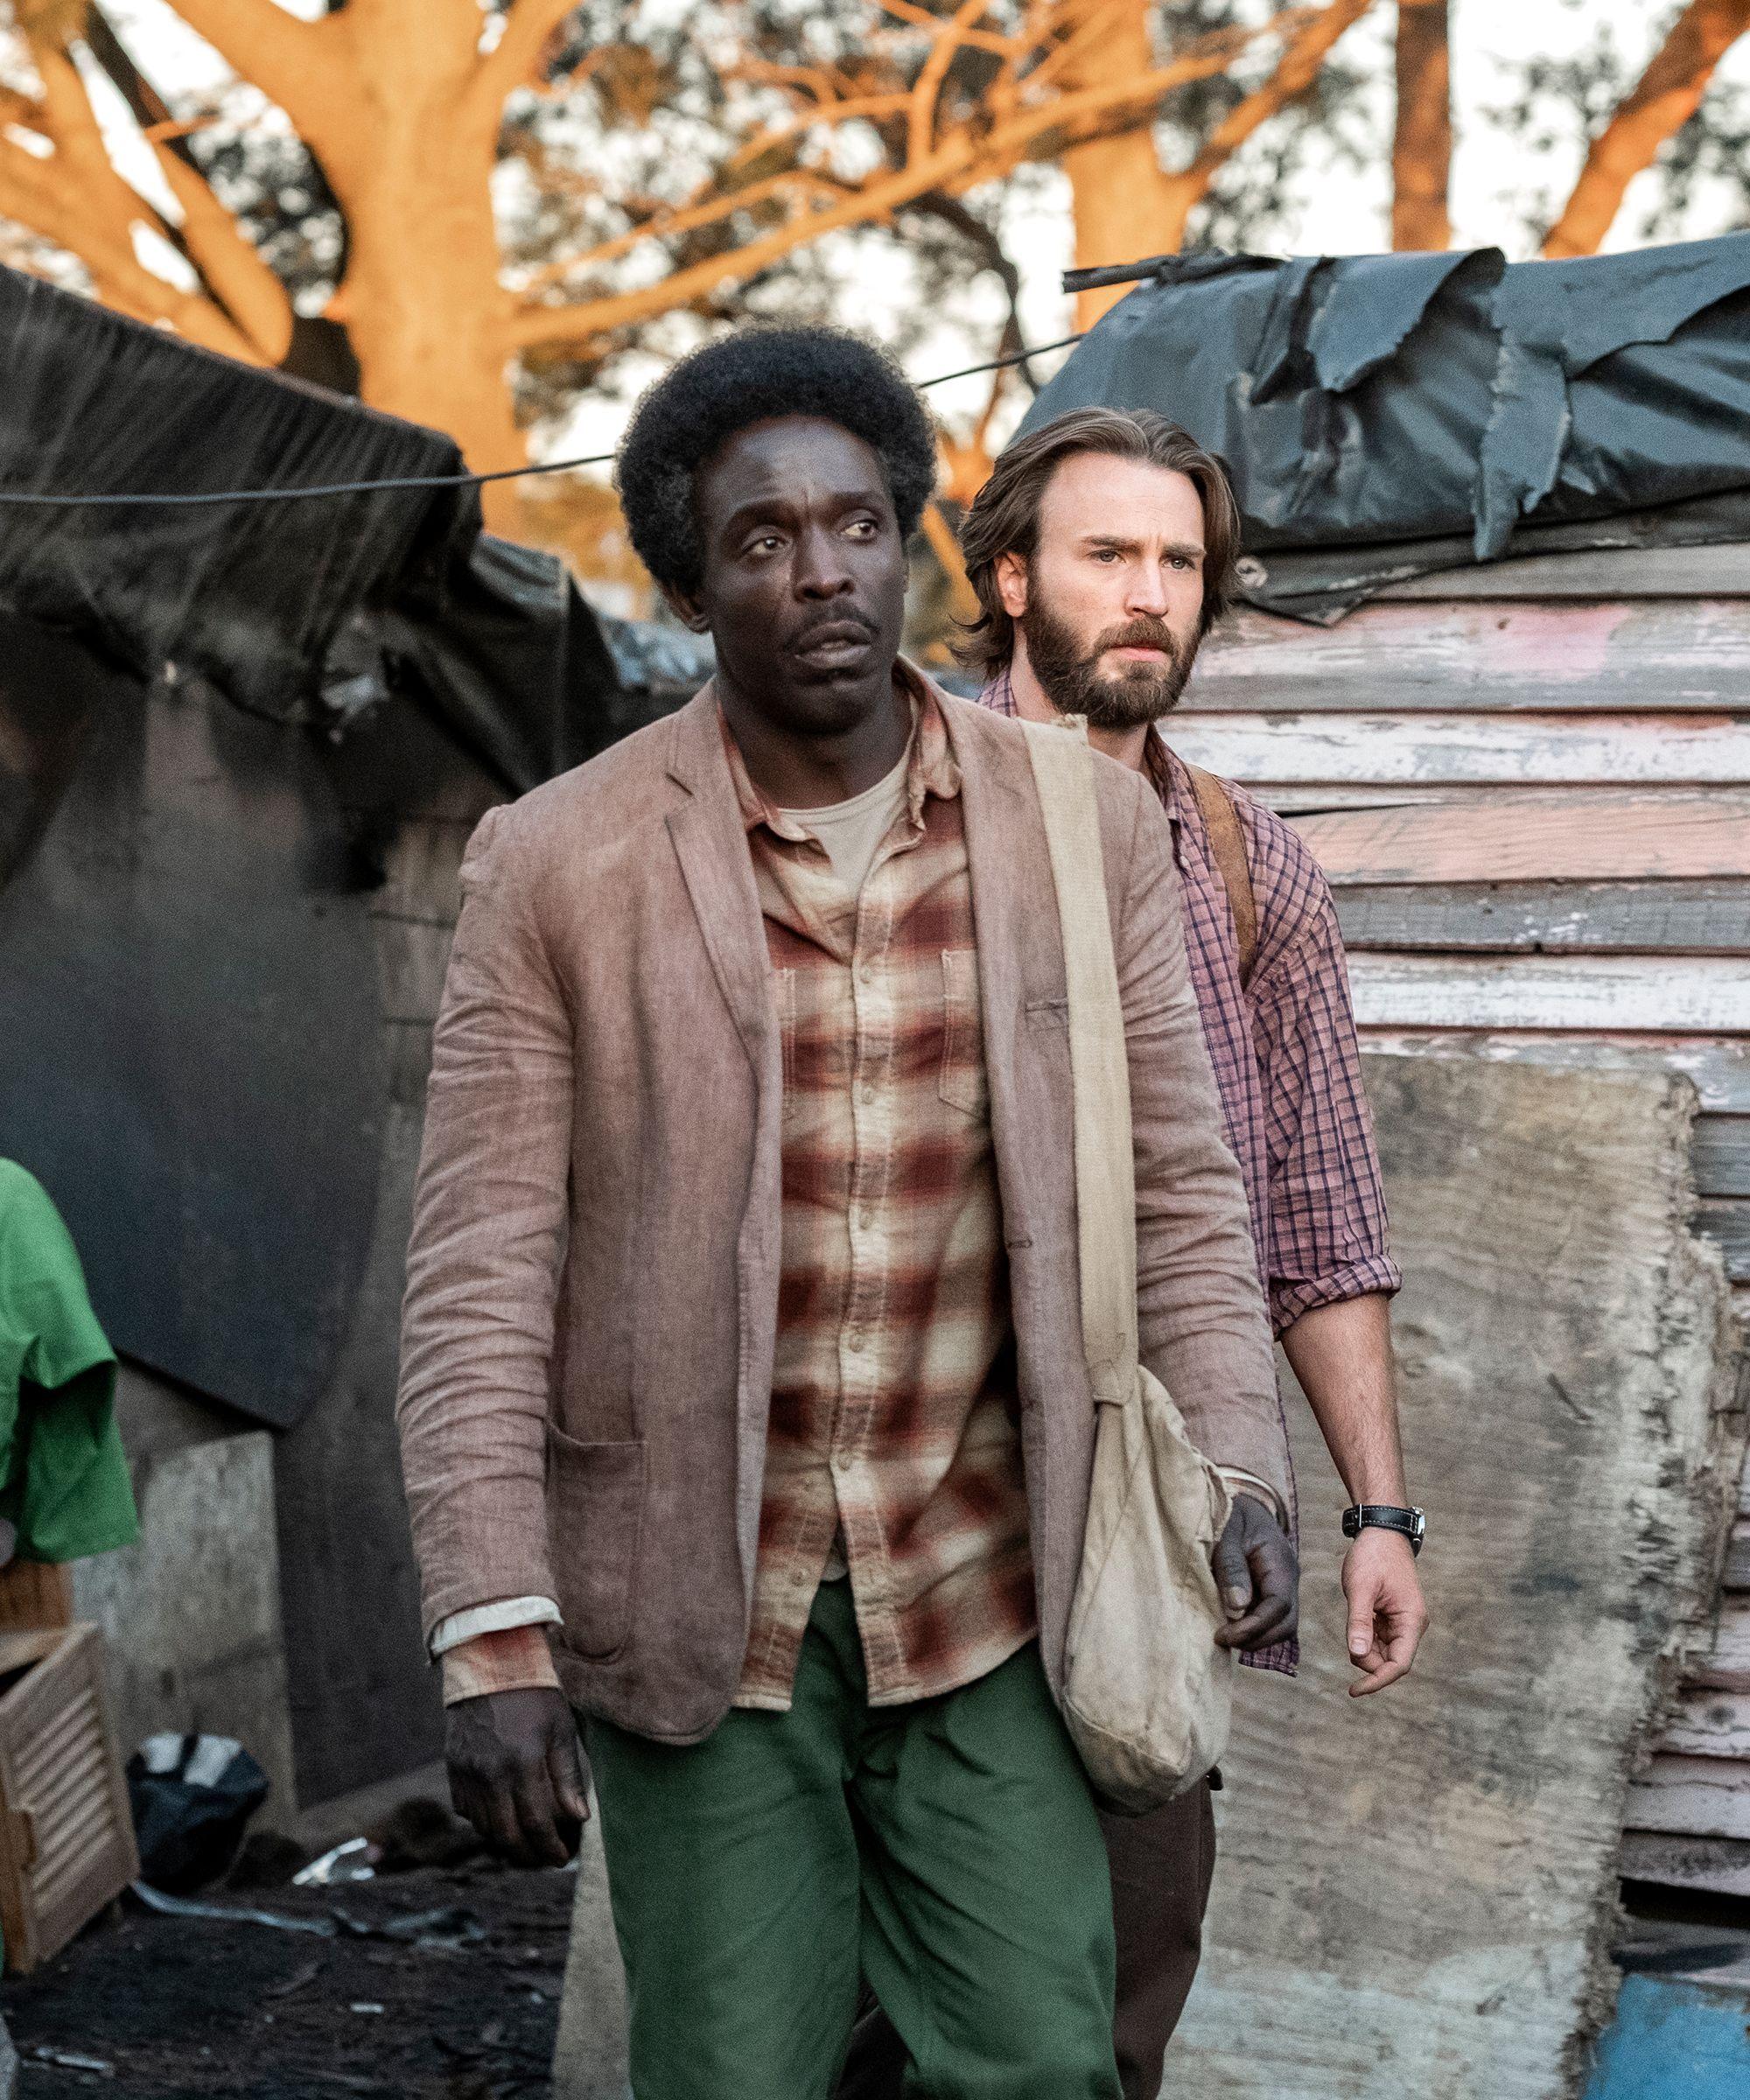 The Wild True Story That Inspired Chris Evans' New Netflix